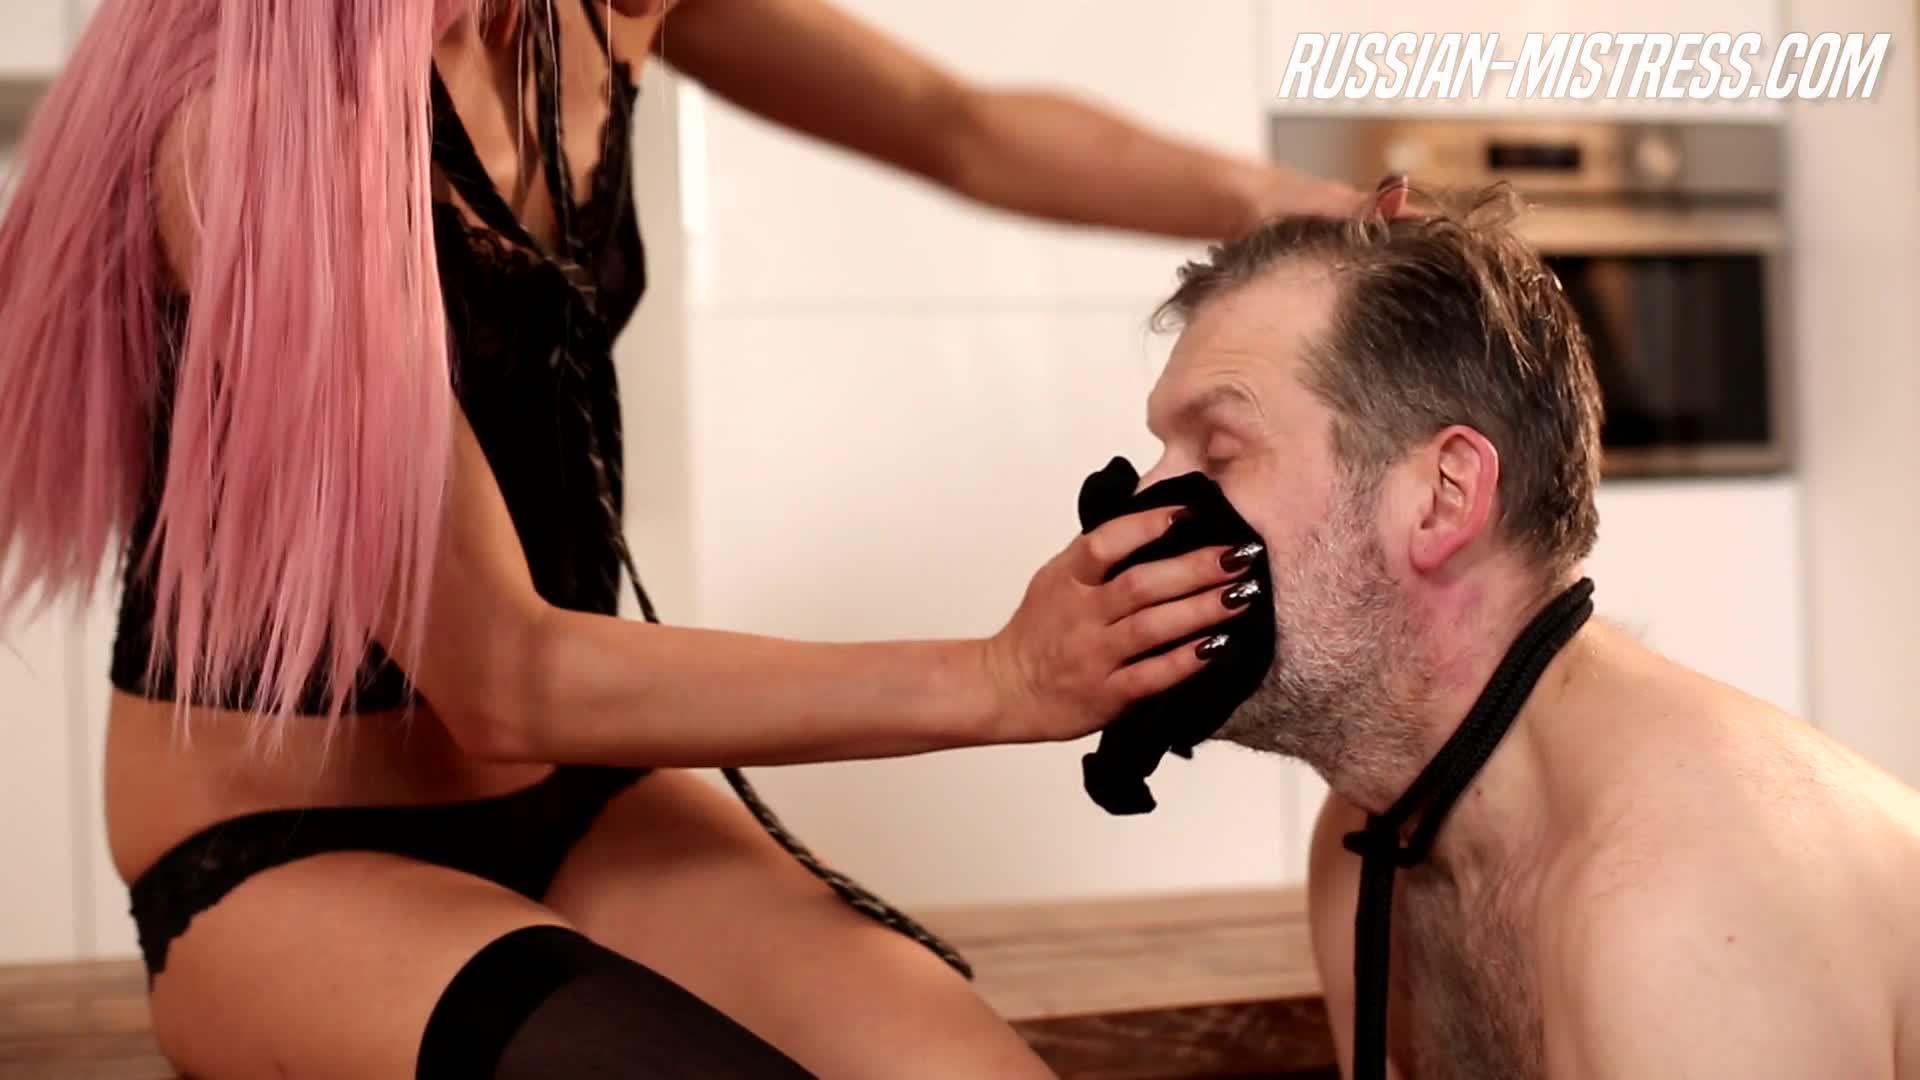 Russian Femdom Foot Fetish